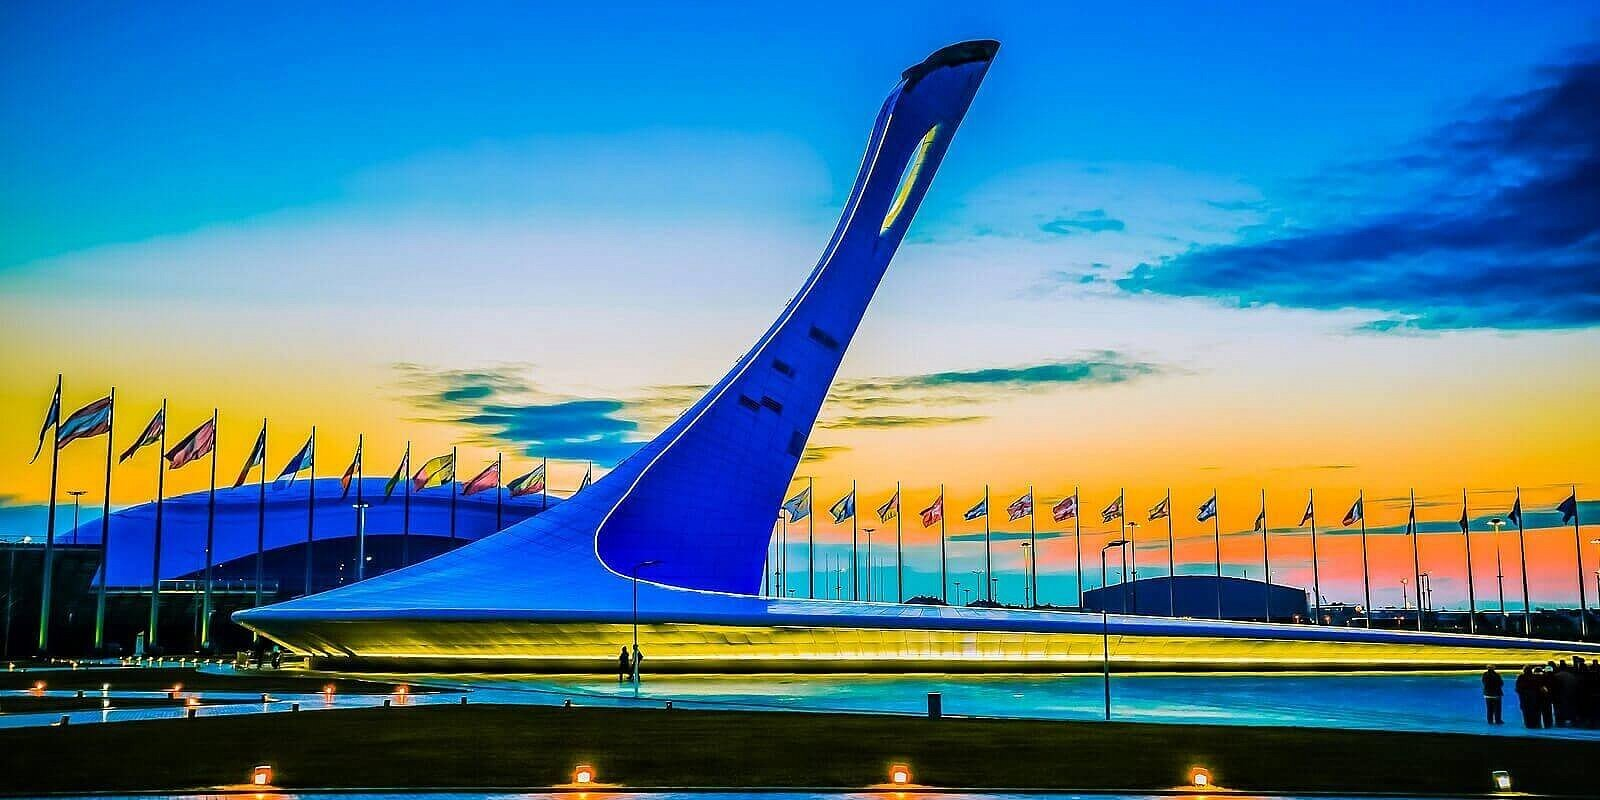 олимпийский парк сочи экскурсия на Электрокарах #4